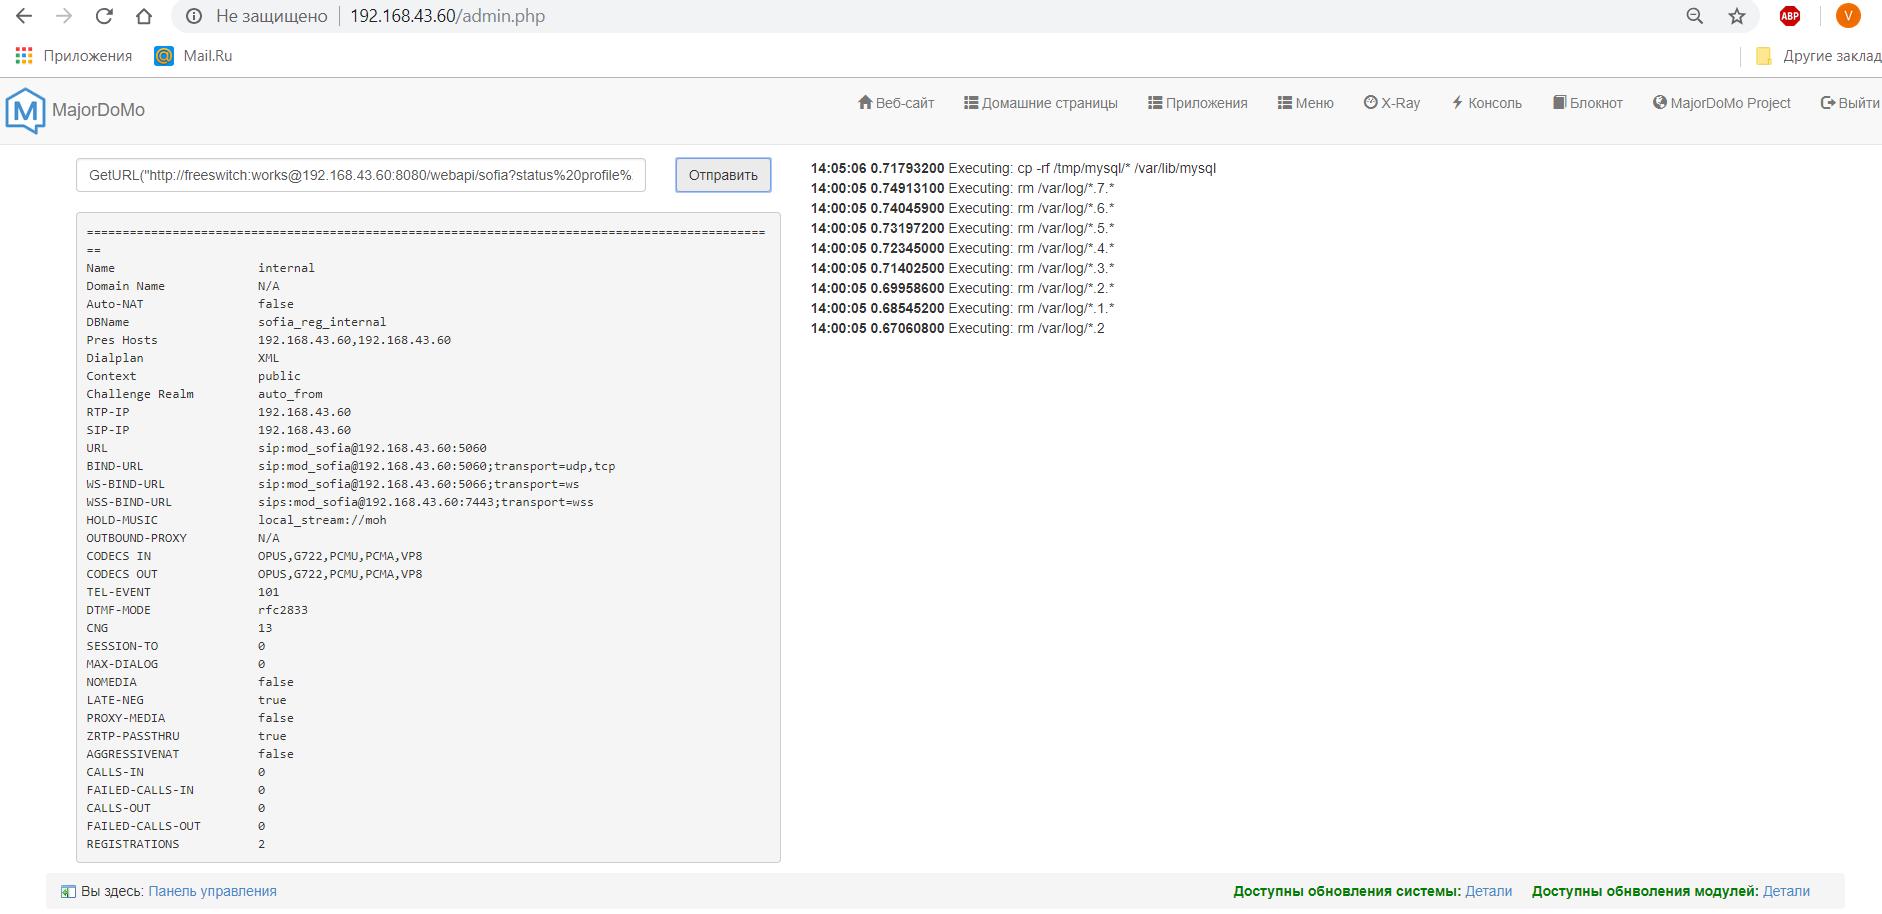 Installing FreeSWITCH 1 8 on Debian 9 (Raspbian Stretch, the